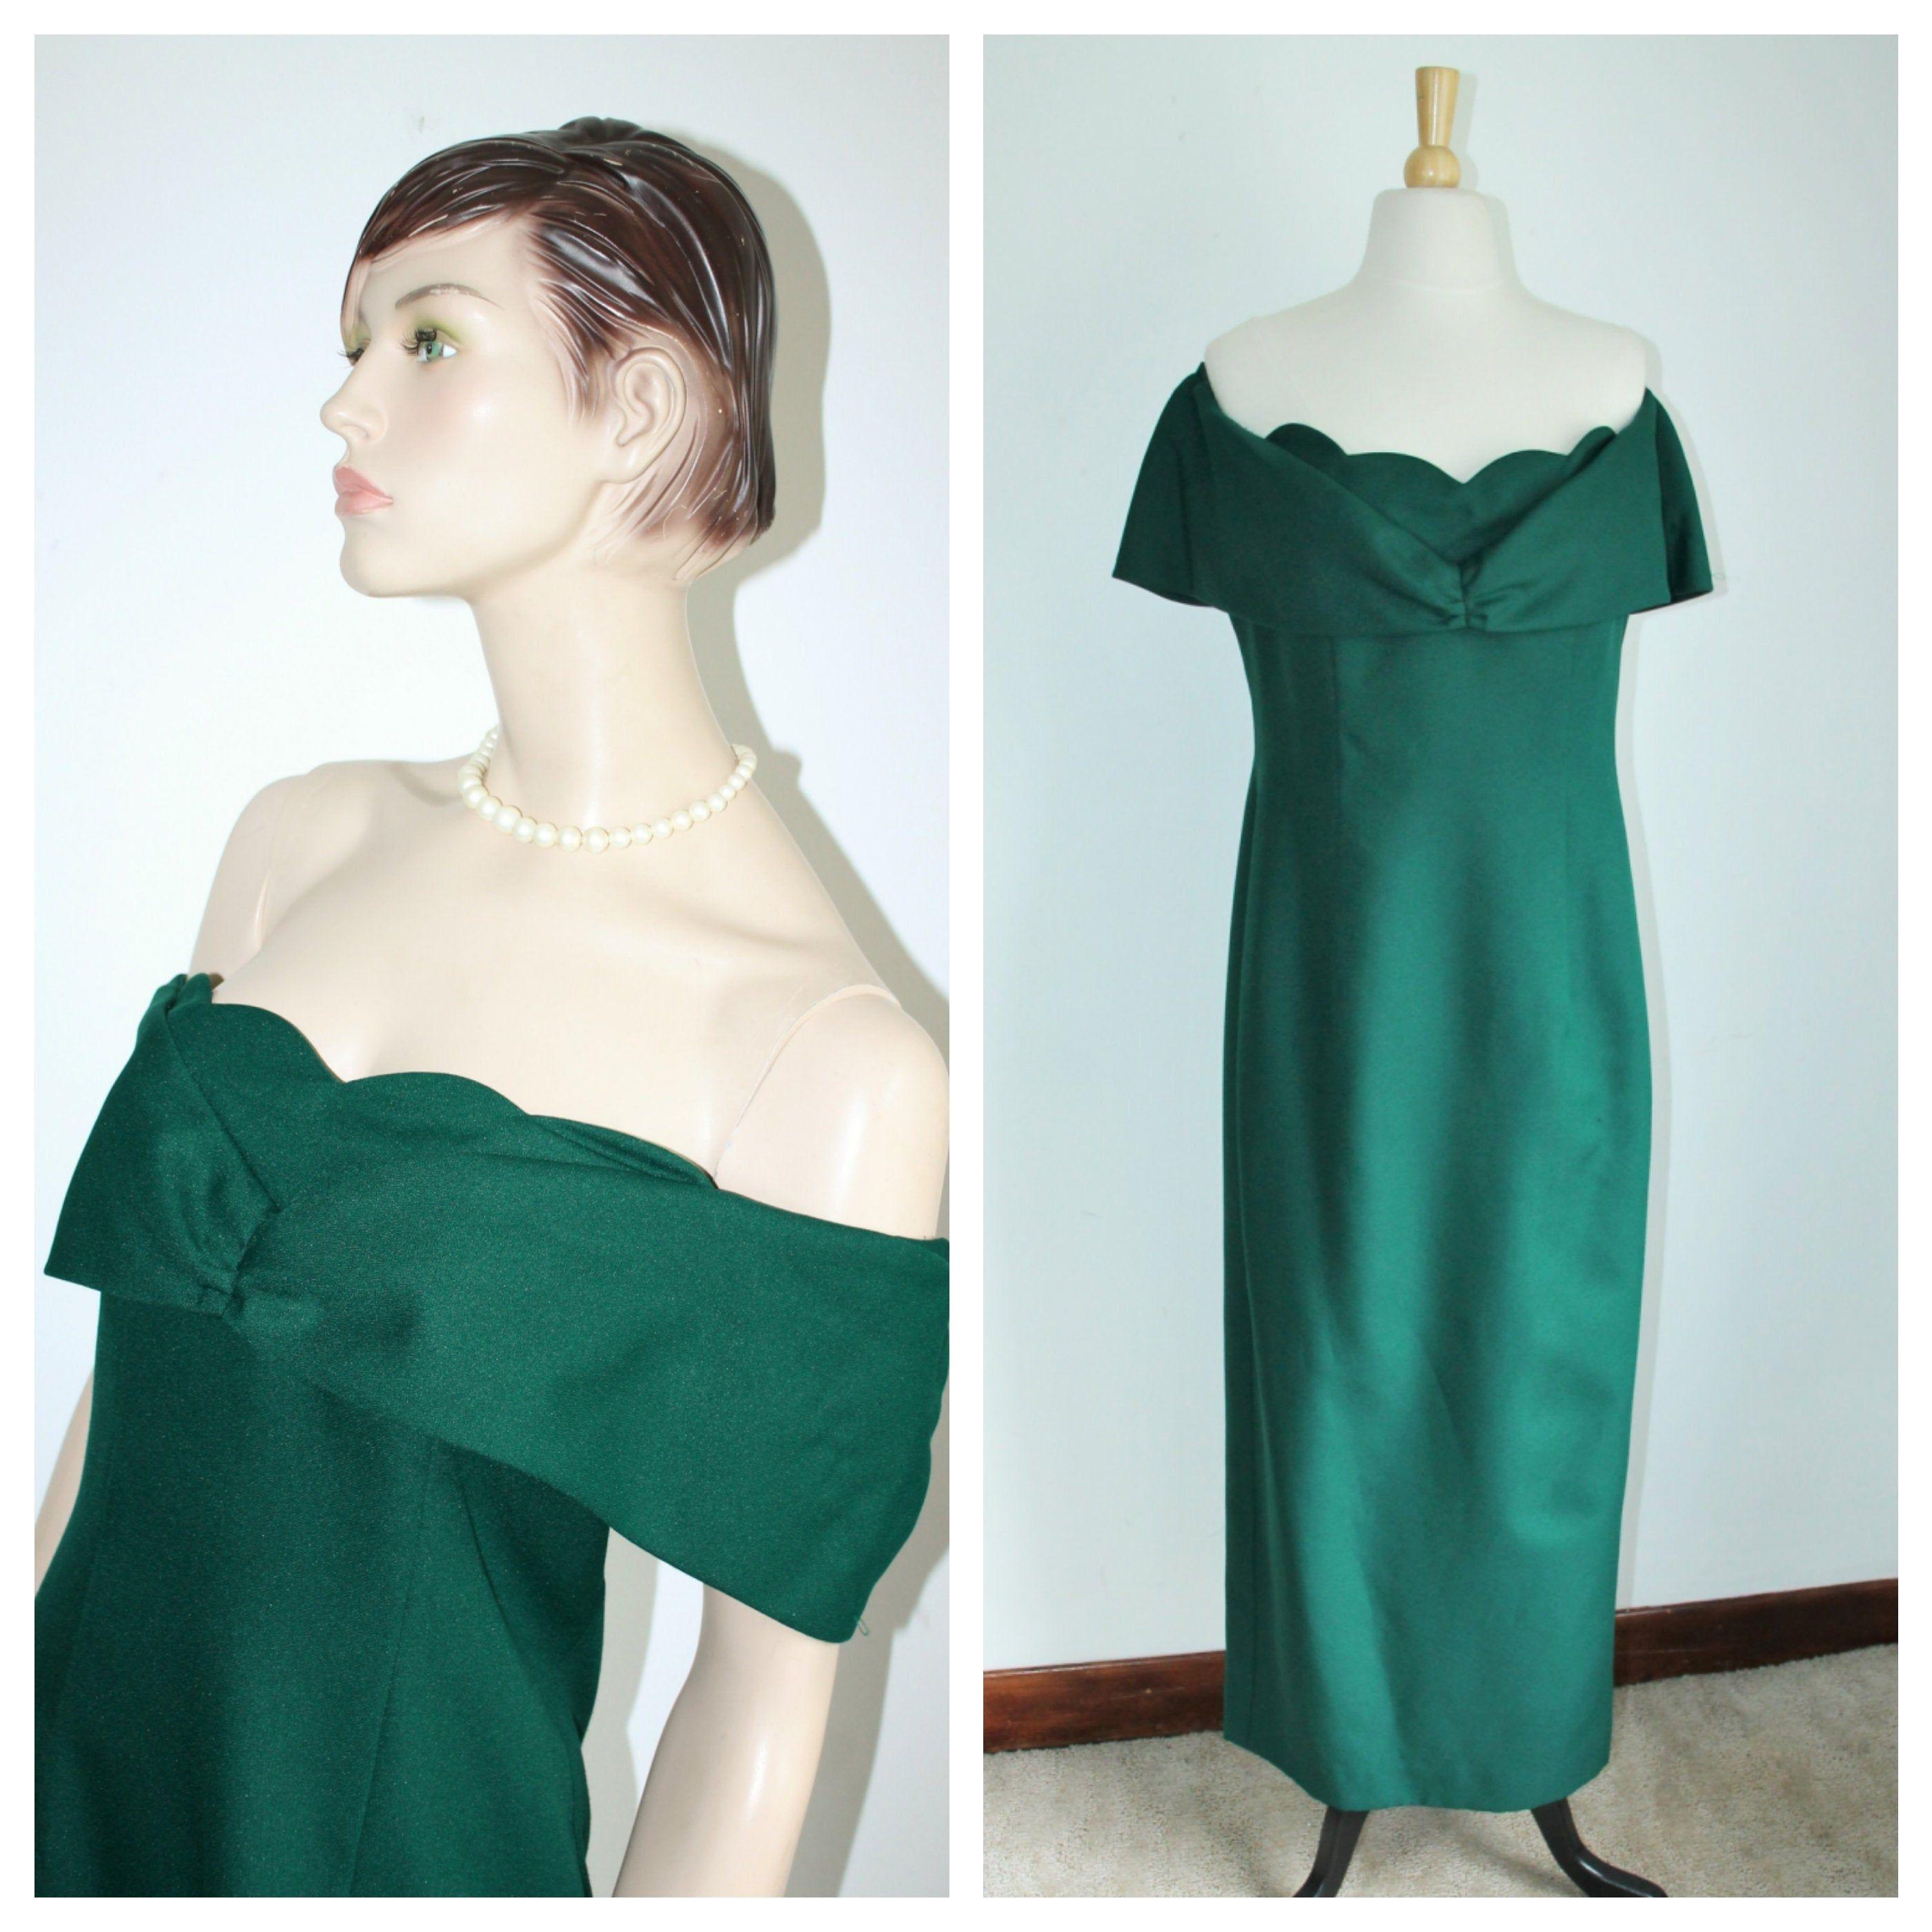 1970 S Dark Green Crepe Evening Gown Vintage Formal Etsy Vintage Formal Wear Evening Gowns Gowns [ 2800 x 2800 Pixel ]